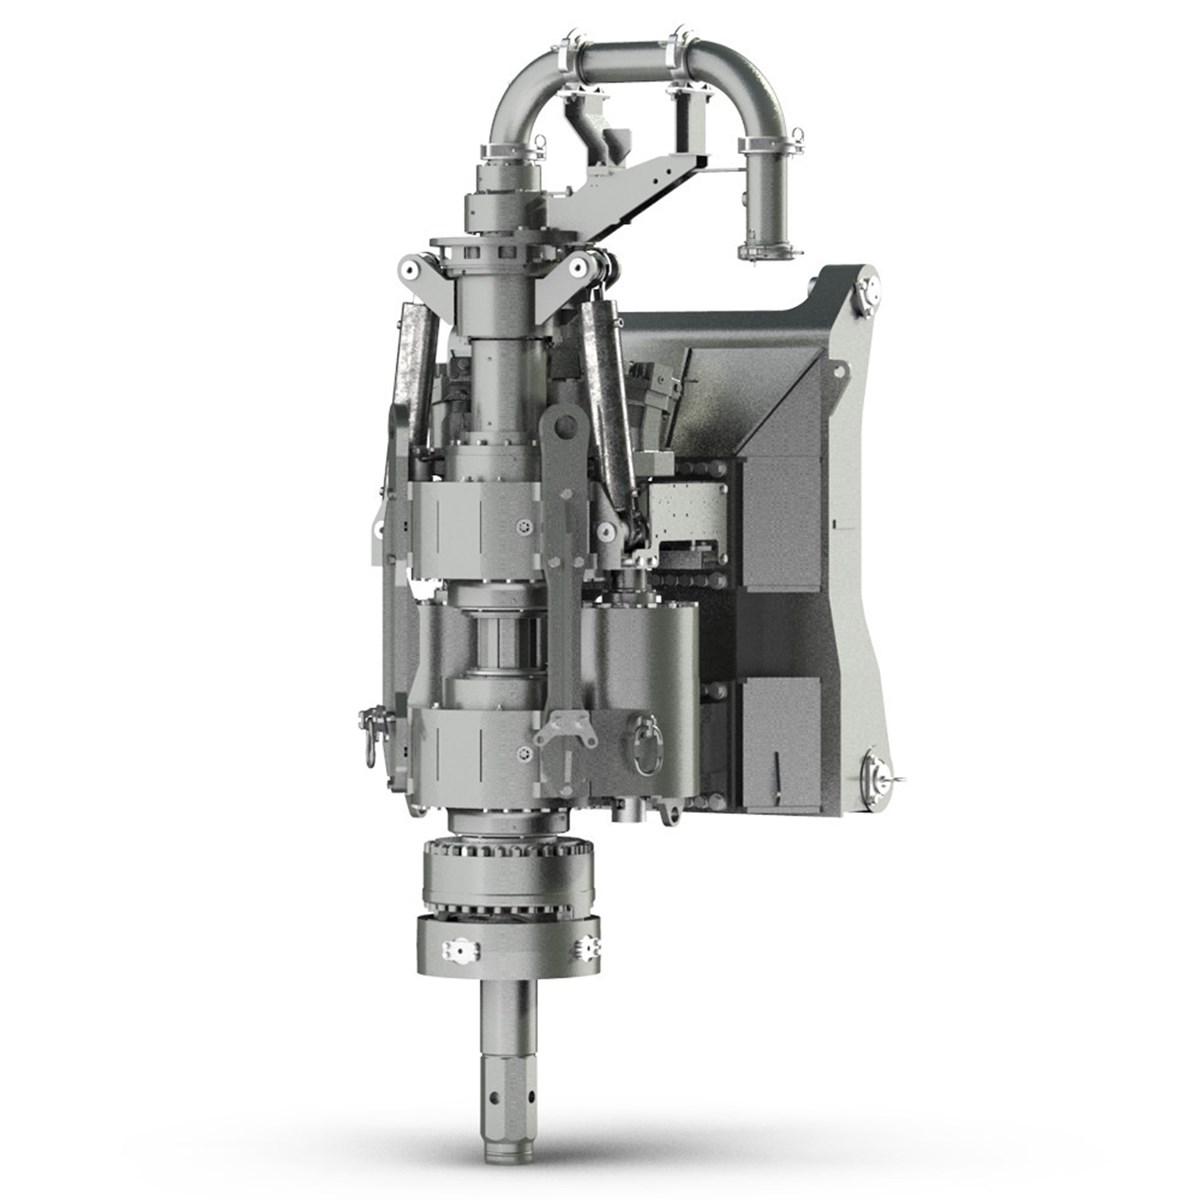 liebherr-double-rotary-drive-doppelkopfbohrantrieb-dba-200.jpg